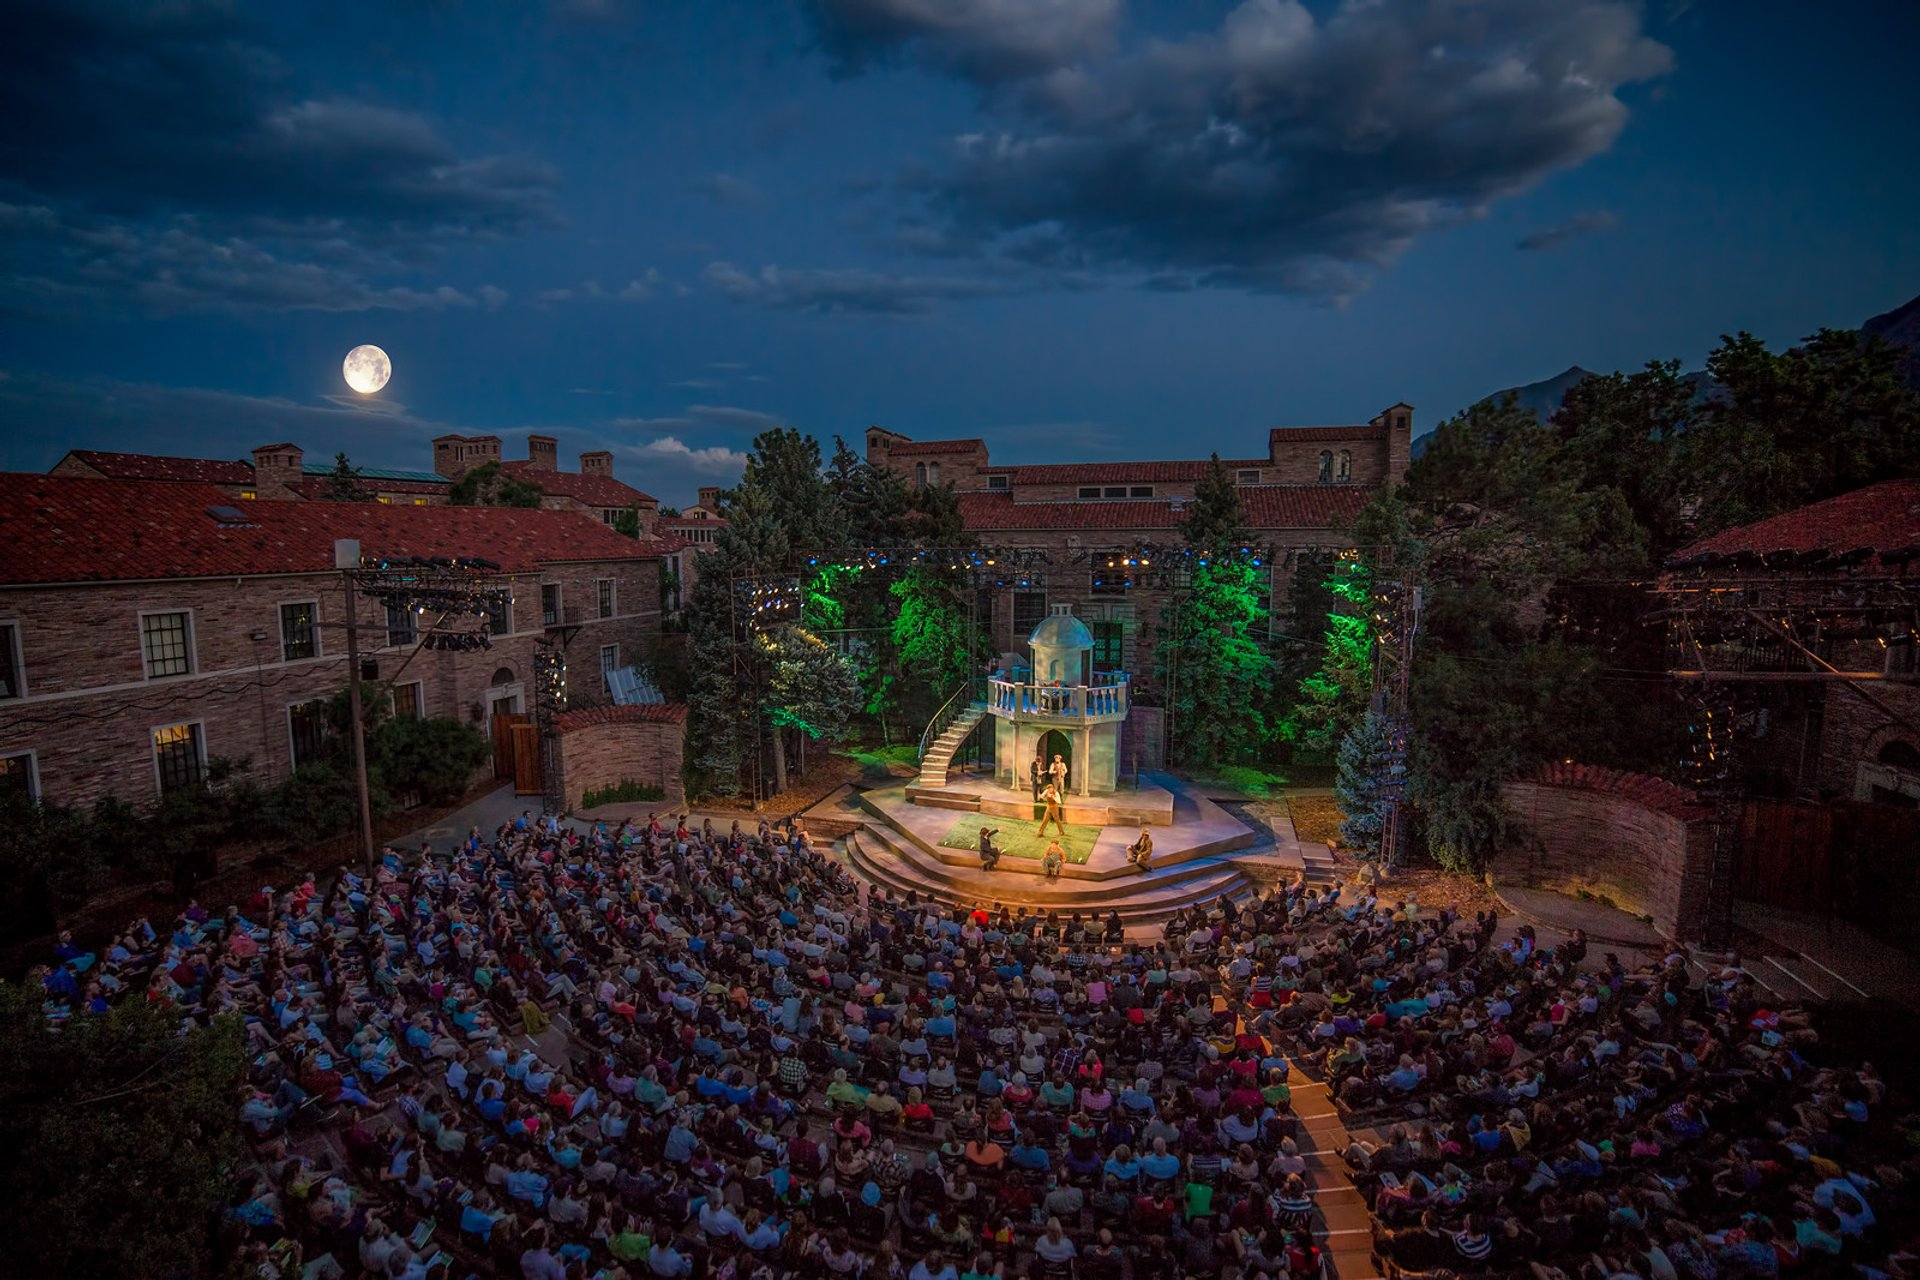 Colorado Shakespeare Festival in Colorado 2019 - Best Time